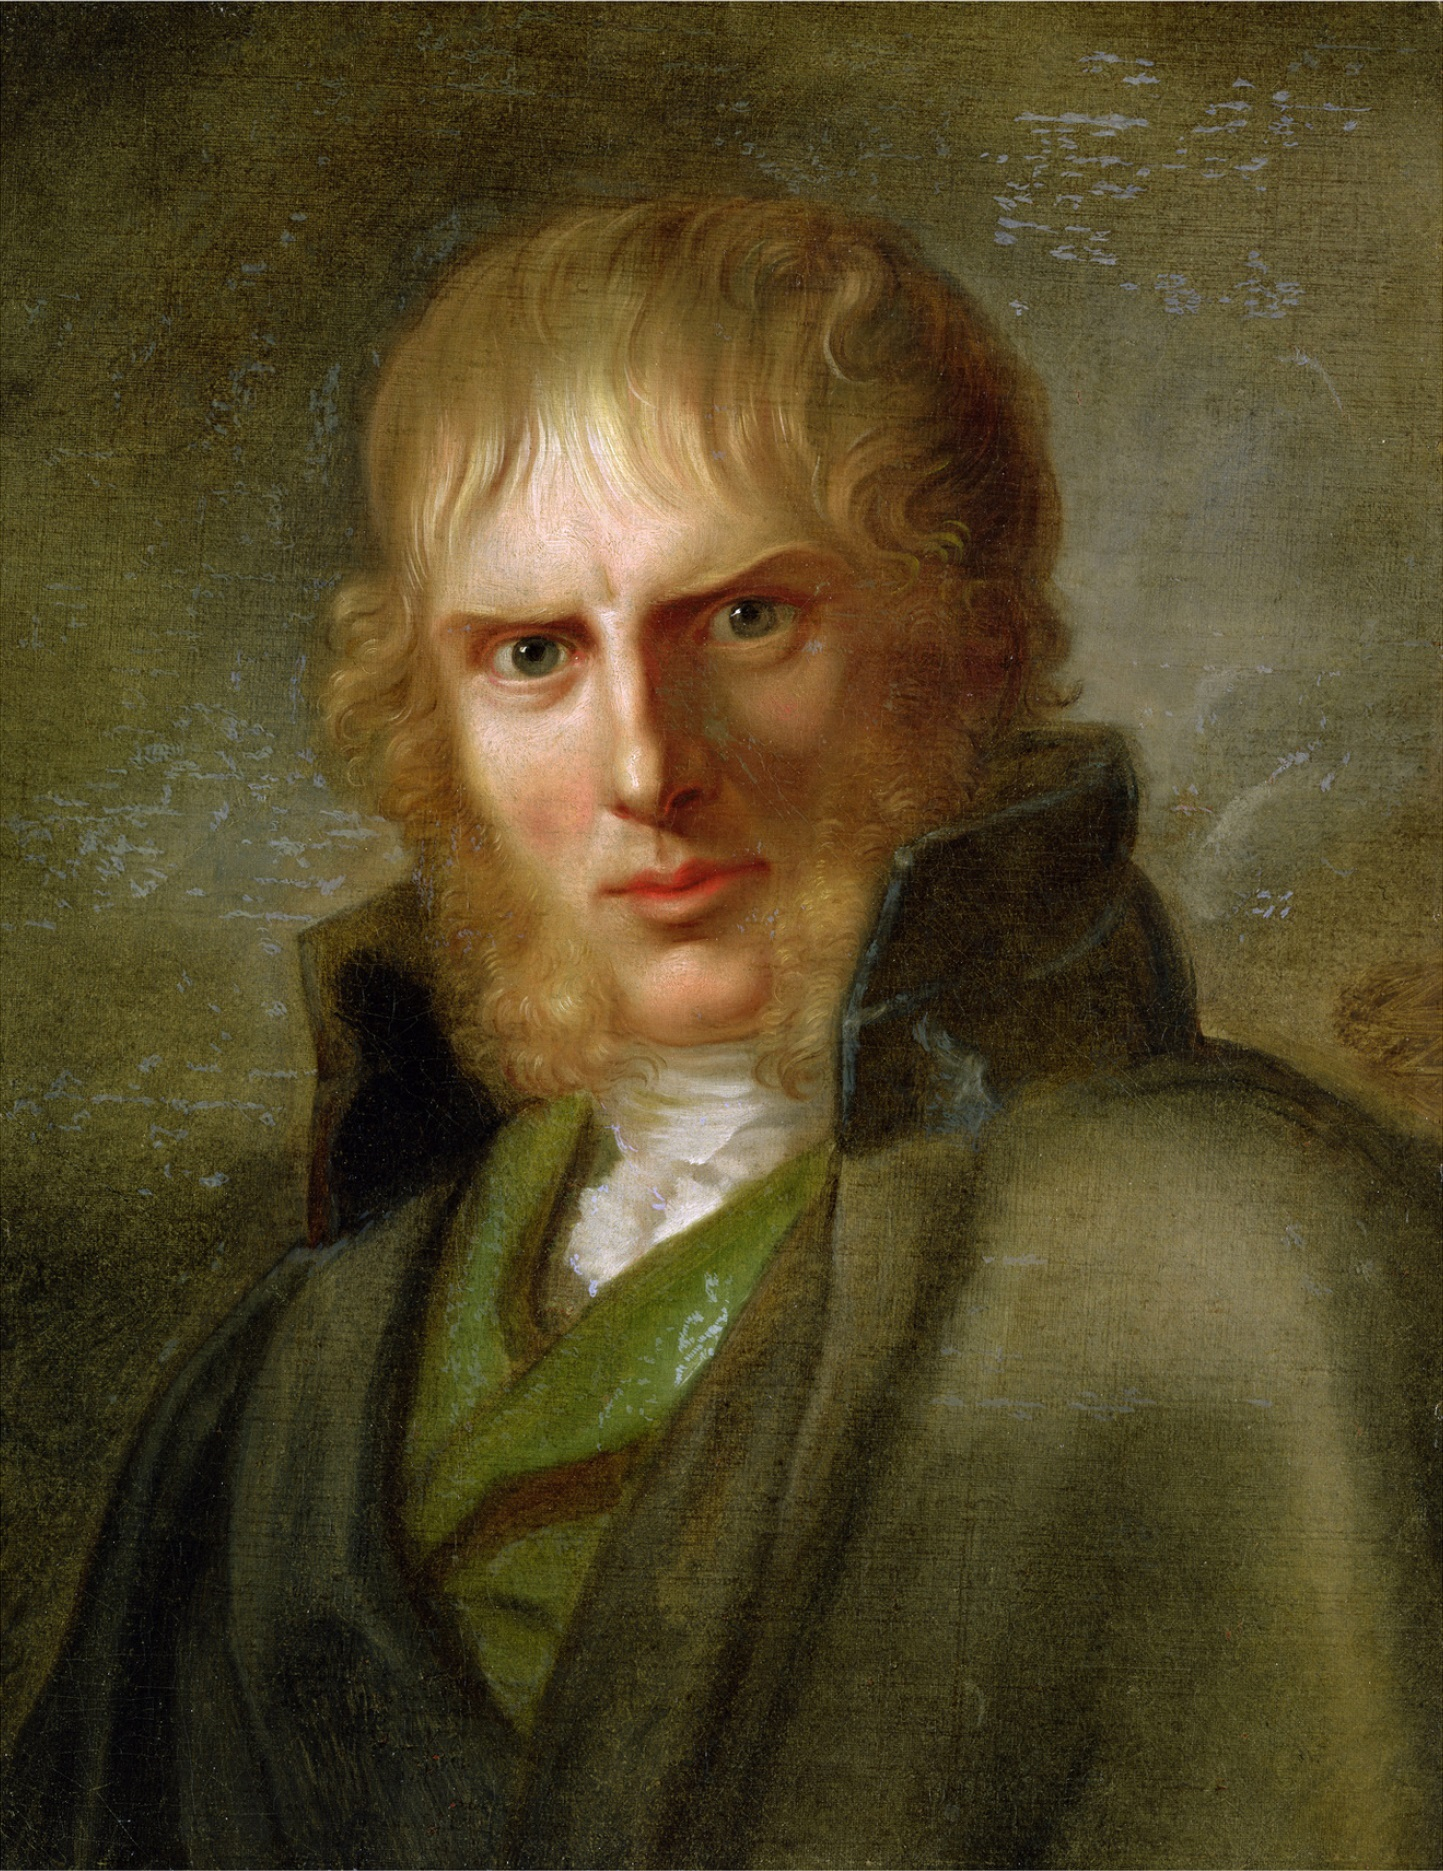 https://i1.wp.com/upload.wikimedia.org/wikipedia/commons/a/ac/Gerhard_von_K%C3%BCgelgen_portrait_of_Friedrich.jpg